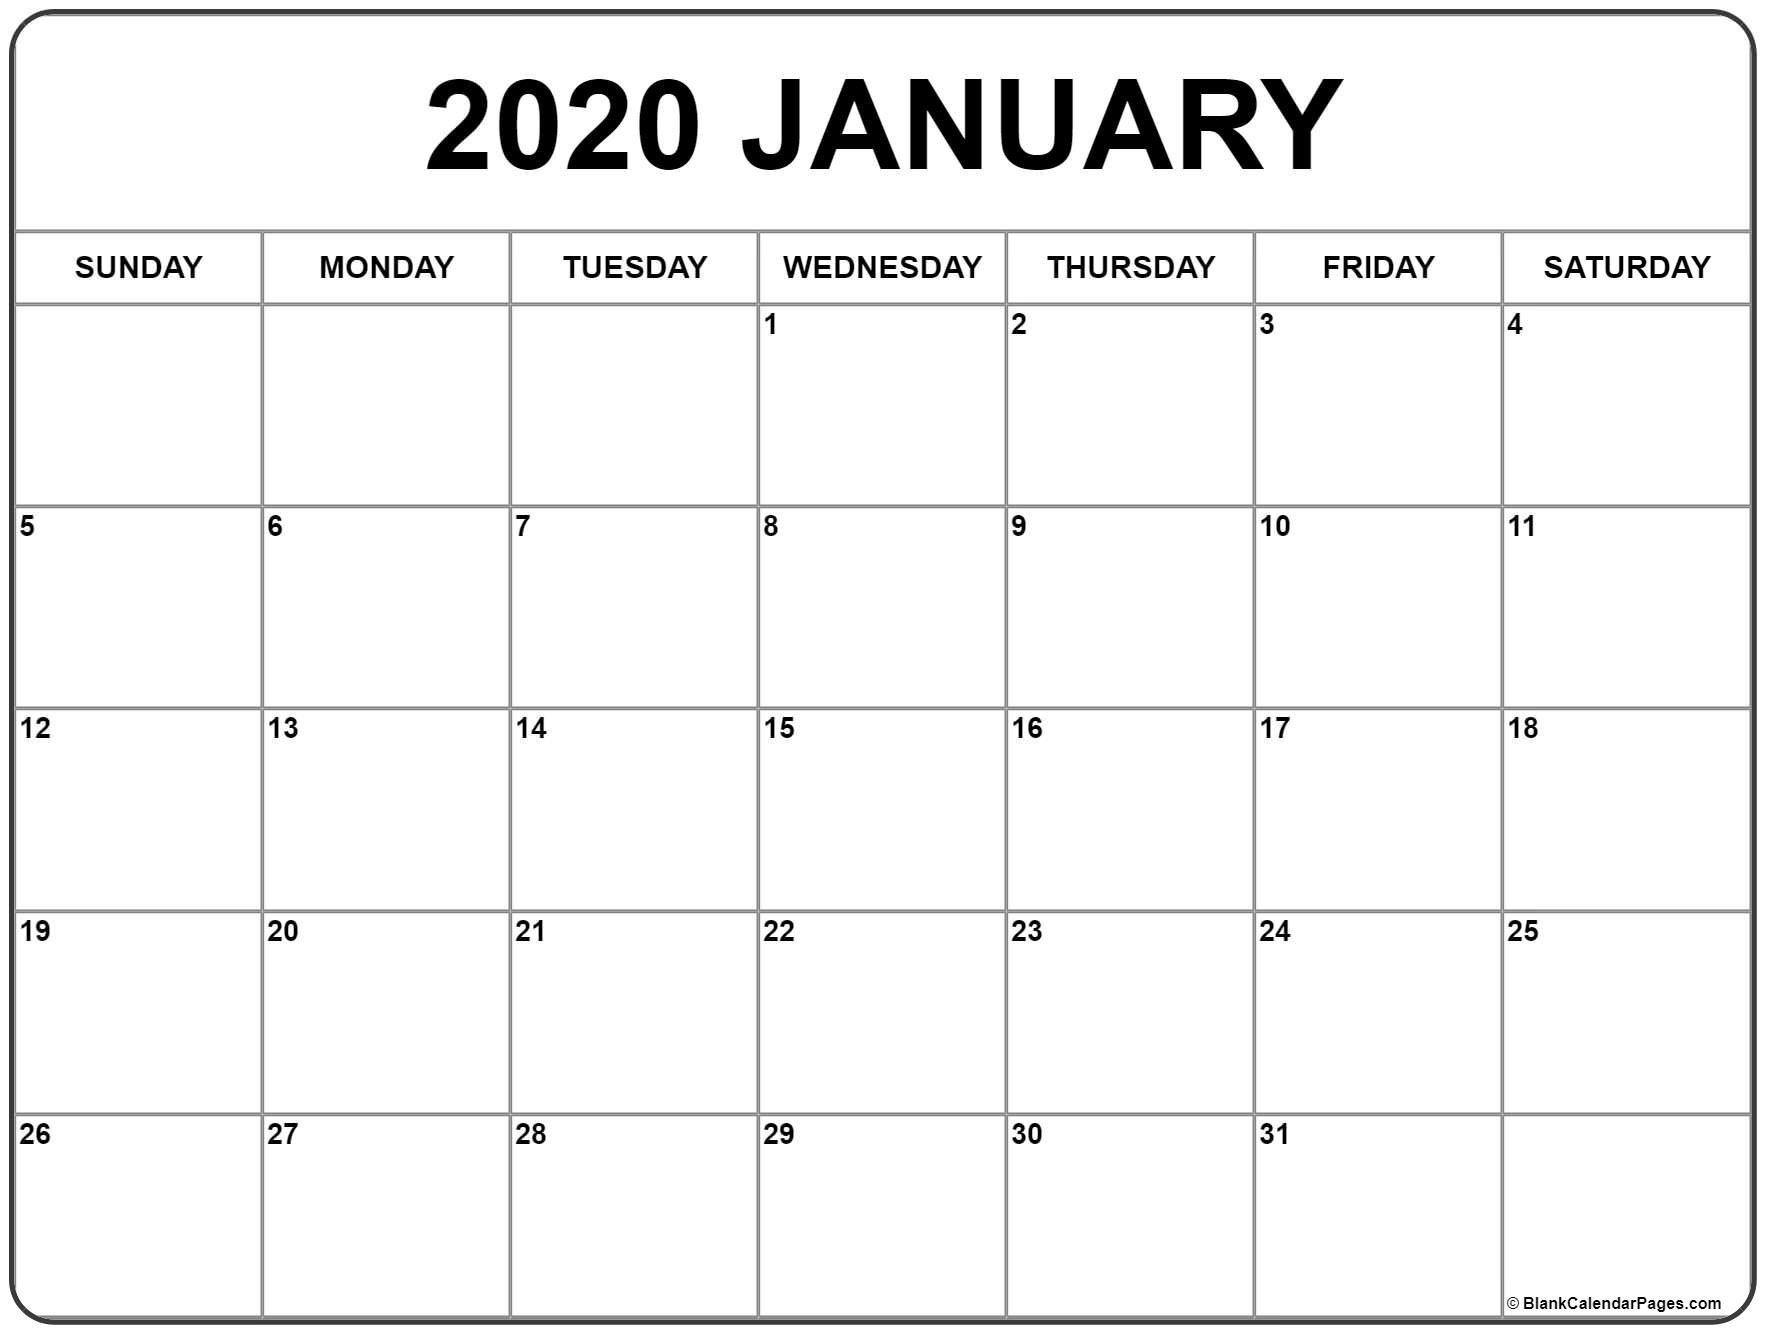 Hfd October 2021 Shift Calendar | Calendar Printables Free Blank intended for Julian Date Army 2021